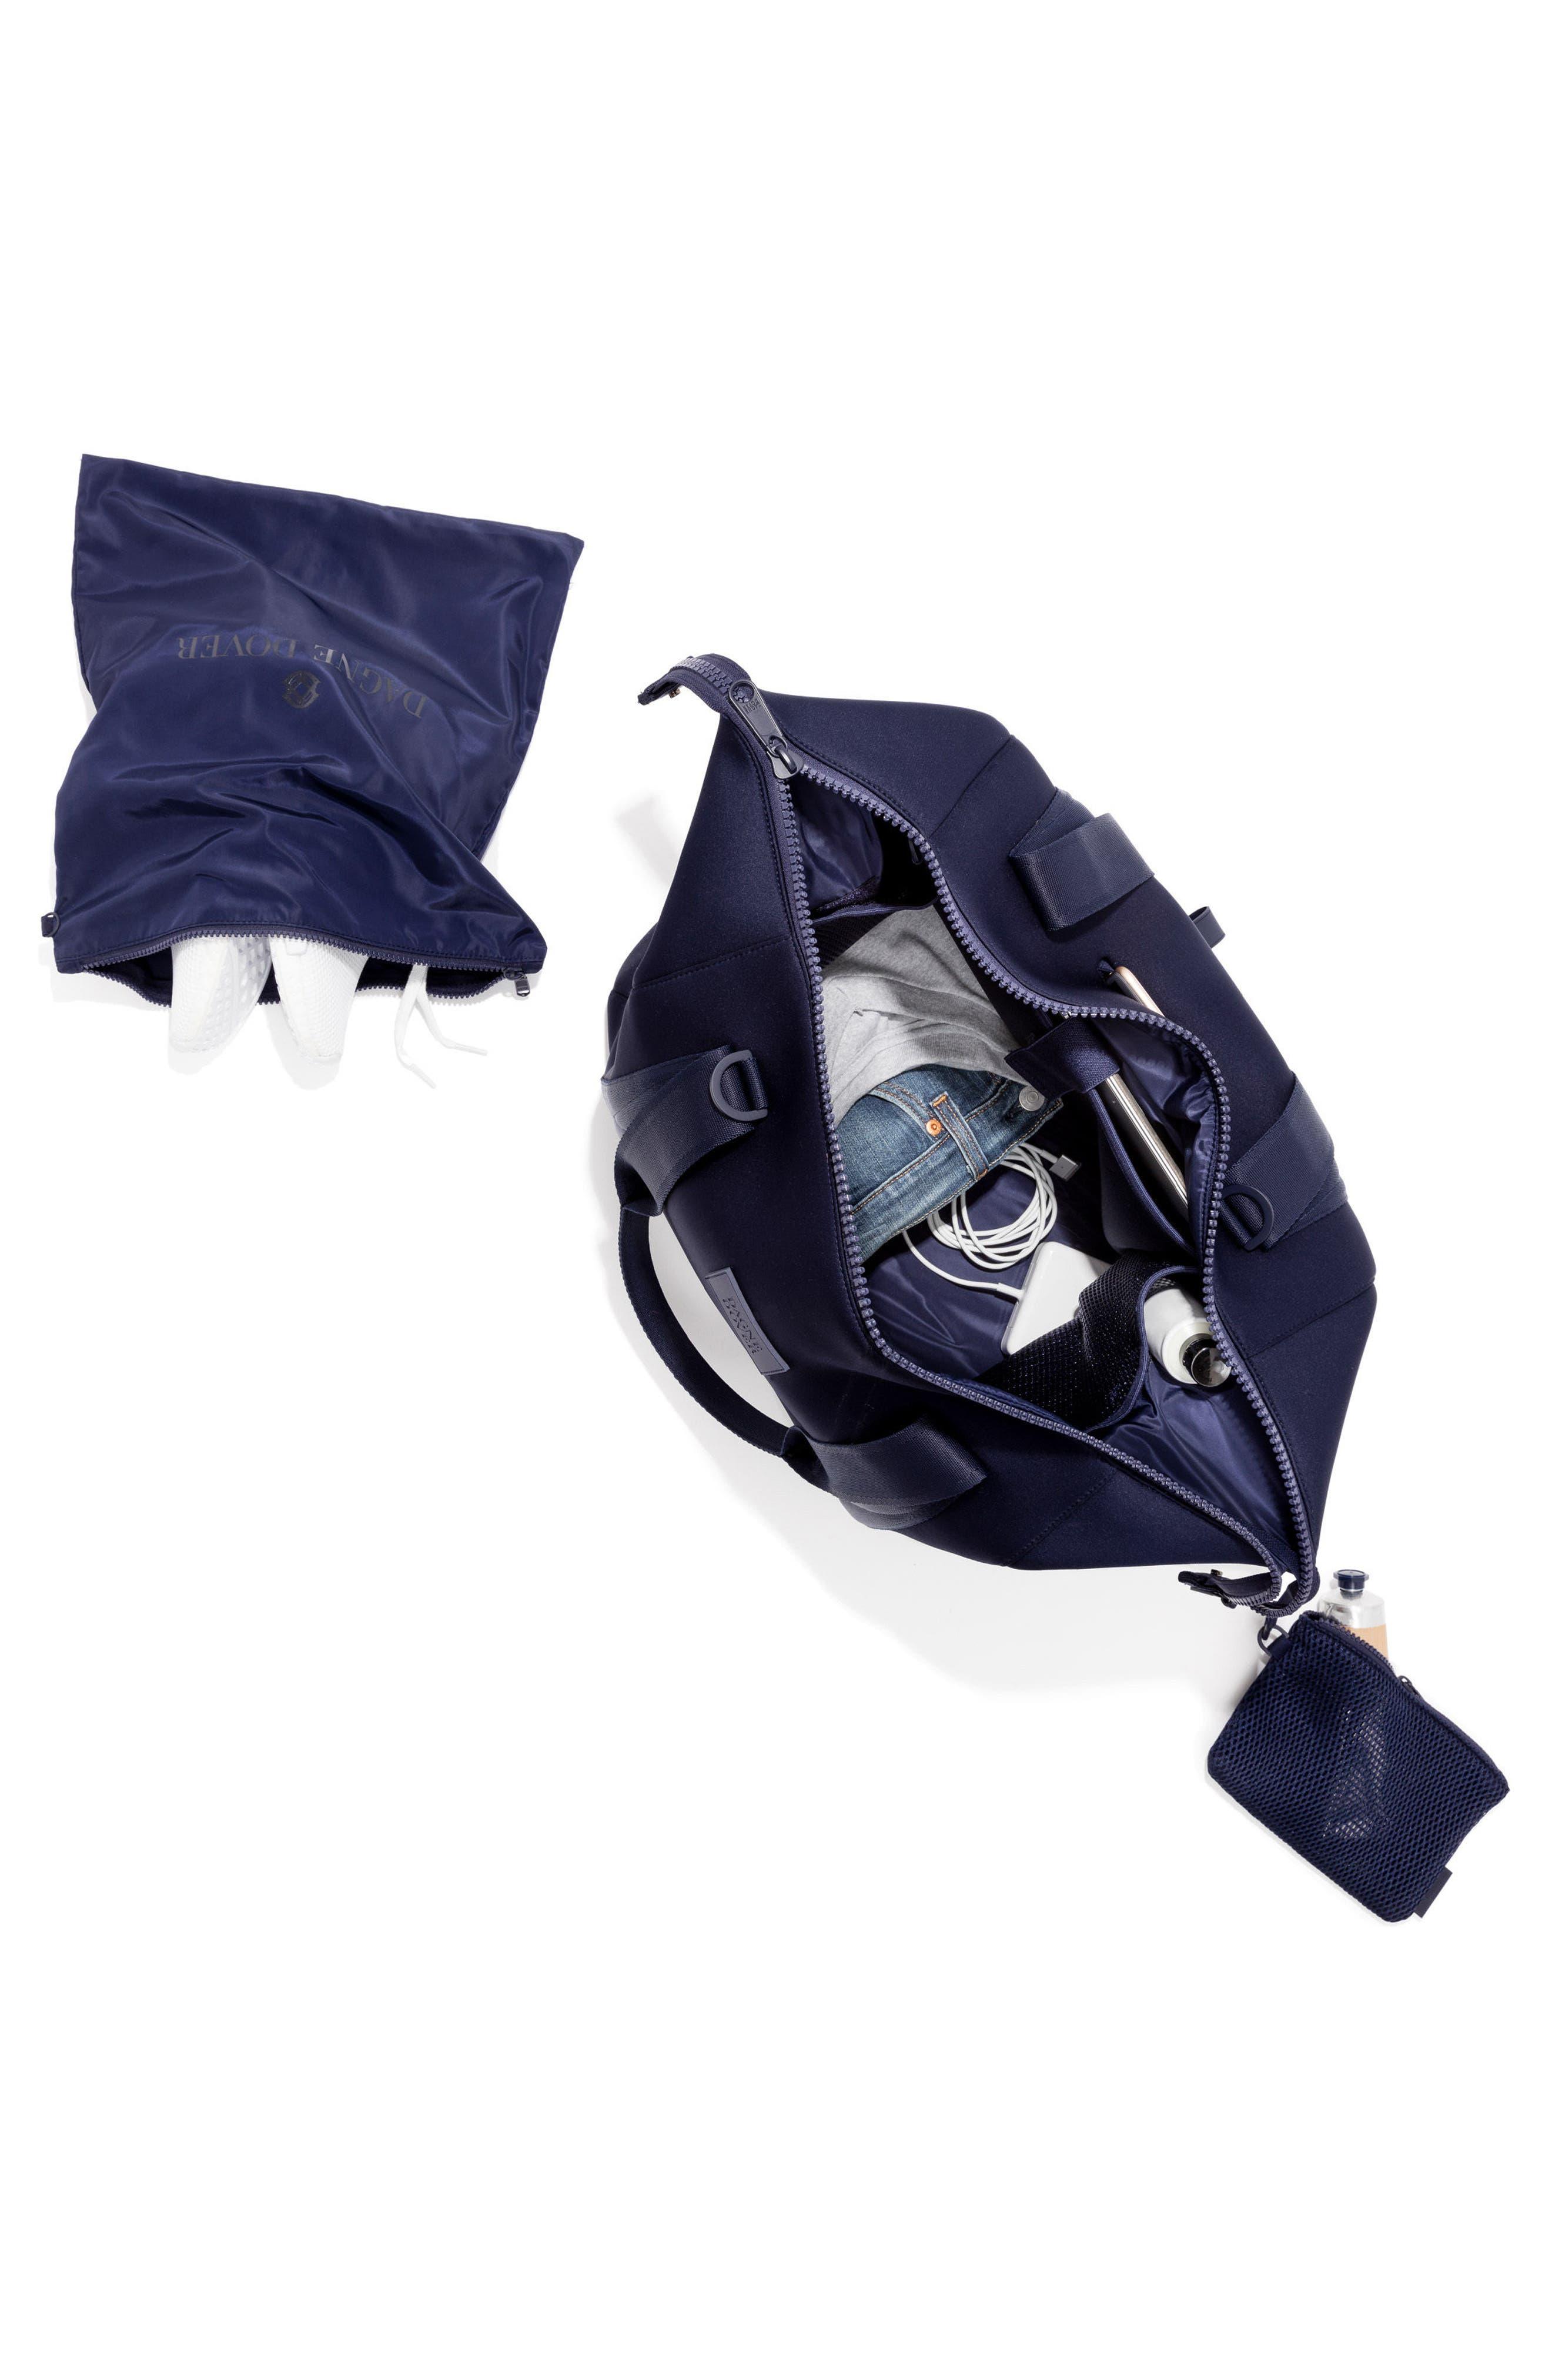 365 Large Landon Neoprene Carryall Duffel Bag,                             Alternate thumbnail 23, color,